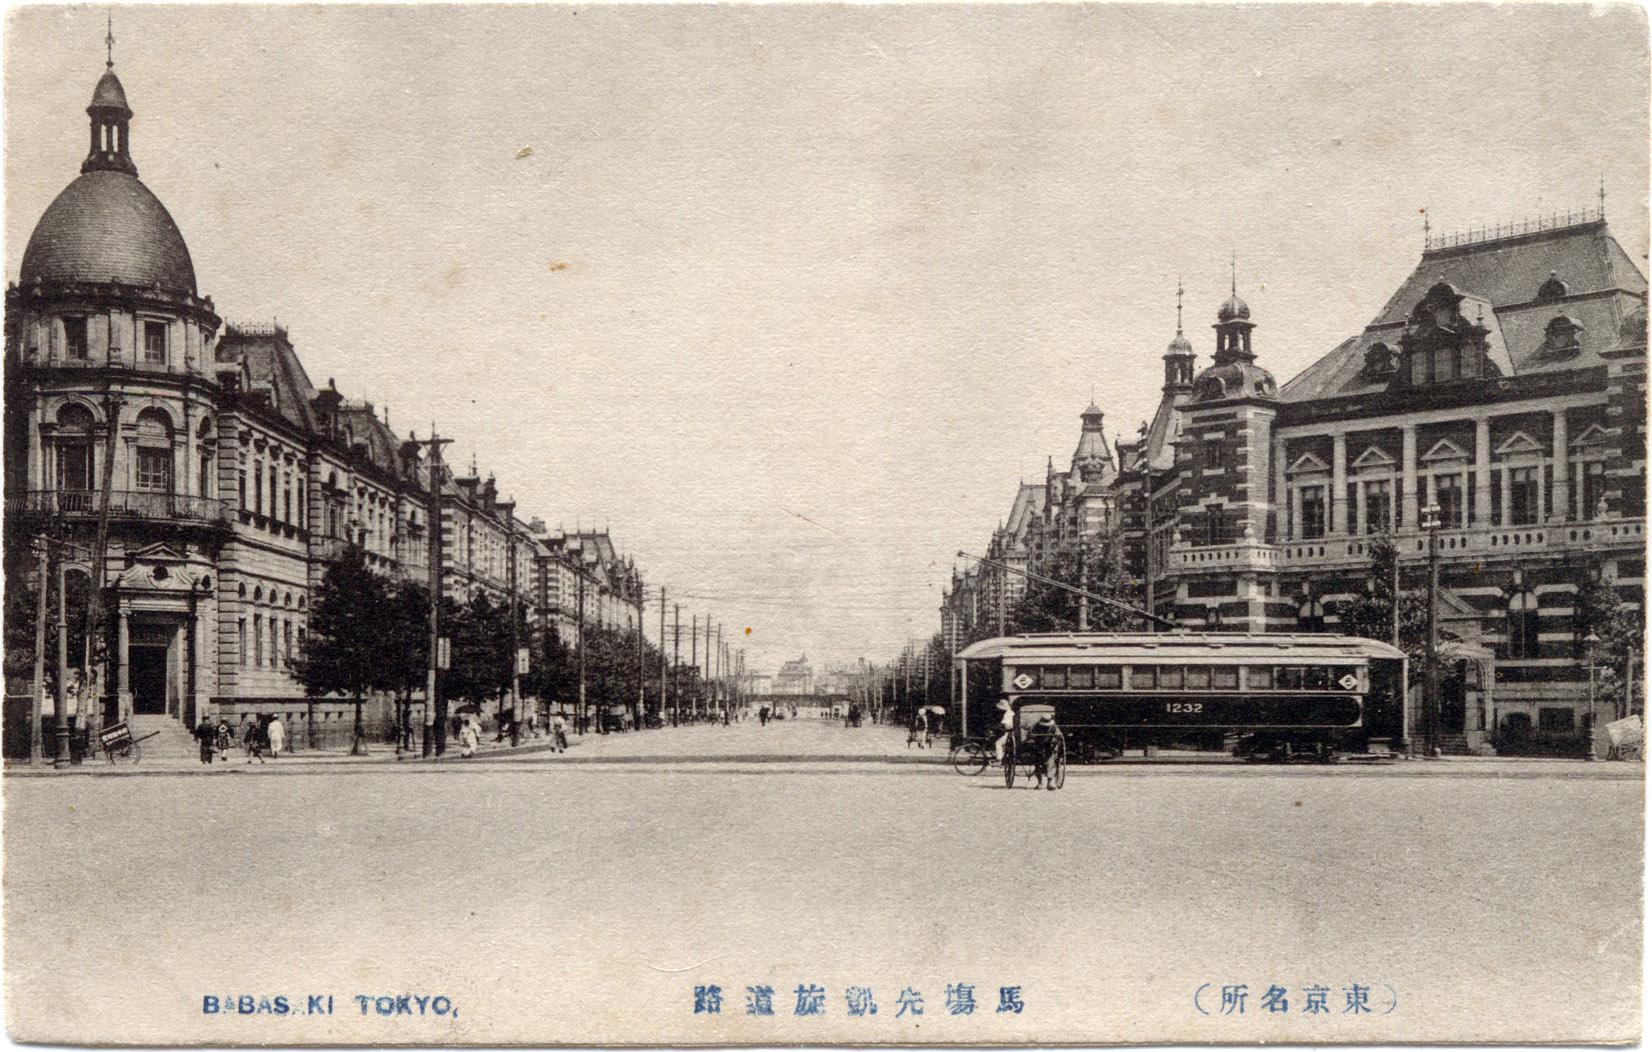 marunouchi-babasaki-londontown-trolley-bw-300.jpg